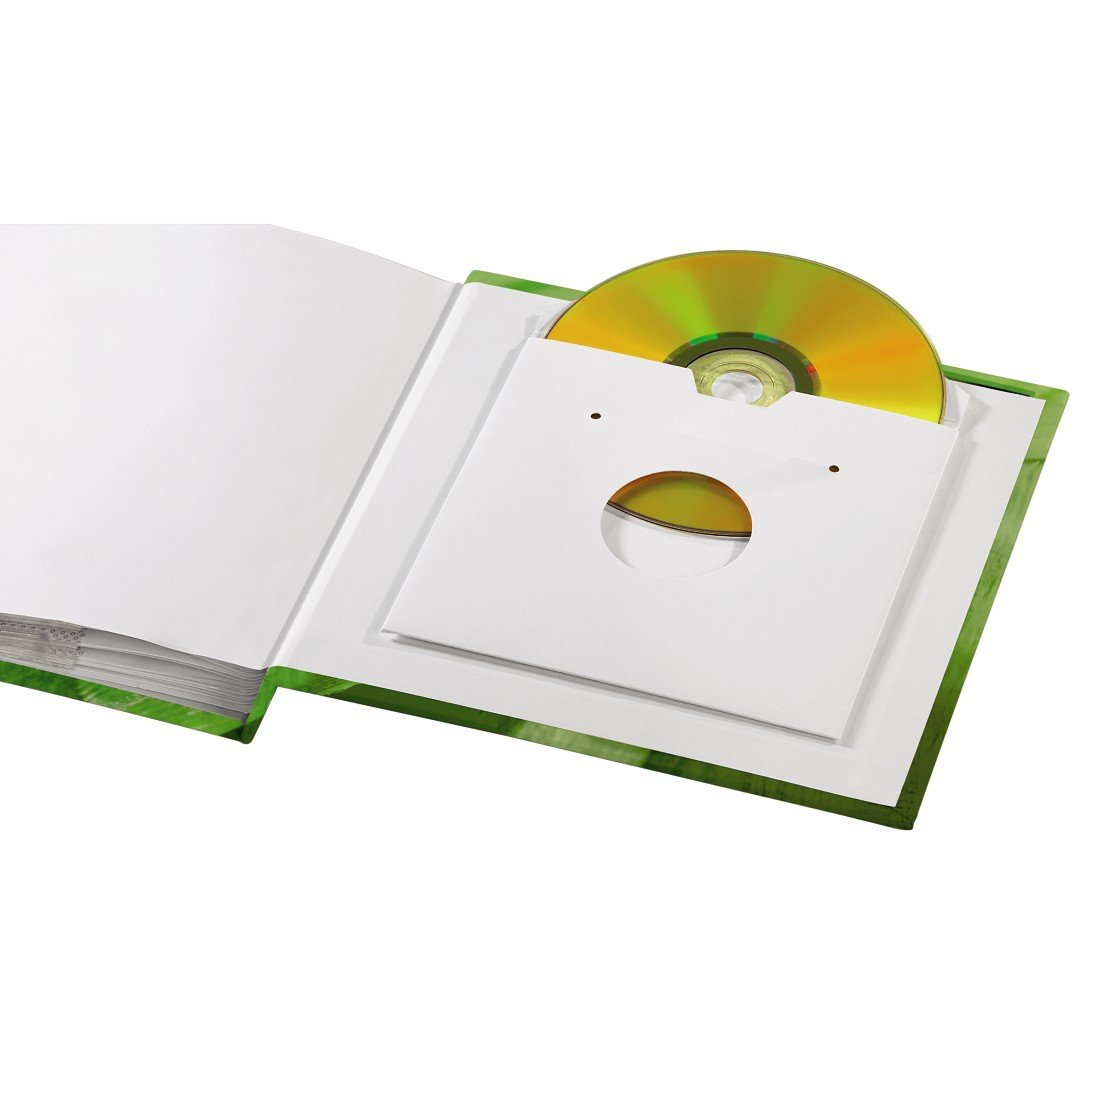 100 Seiten Aqua Hama Memoalbum Singo 22x22,5 cm